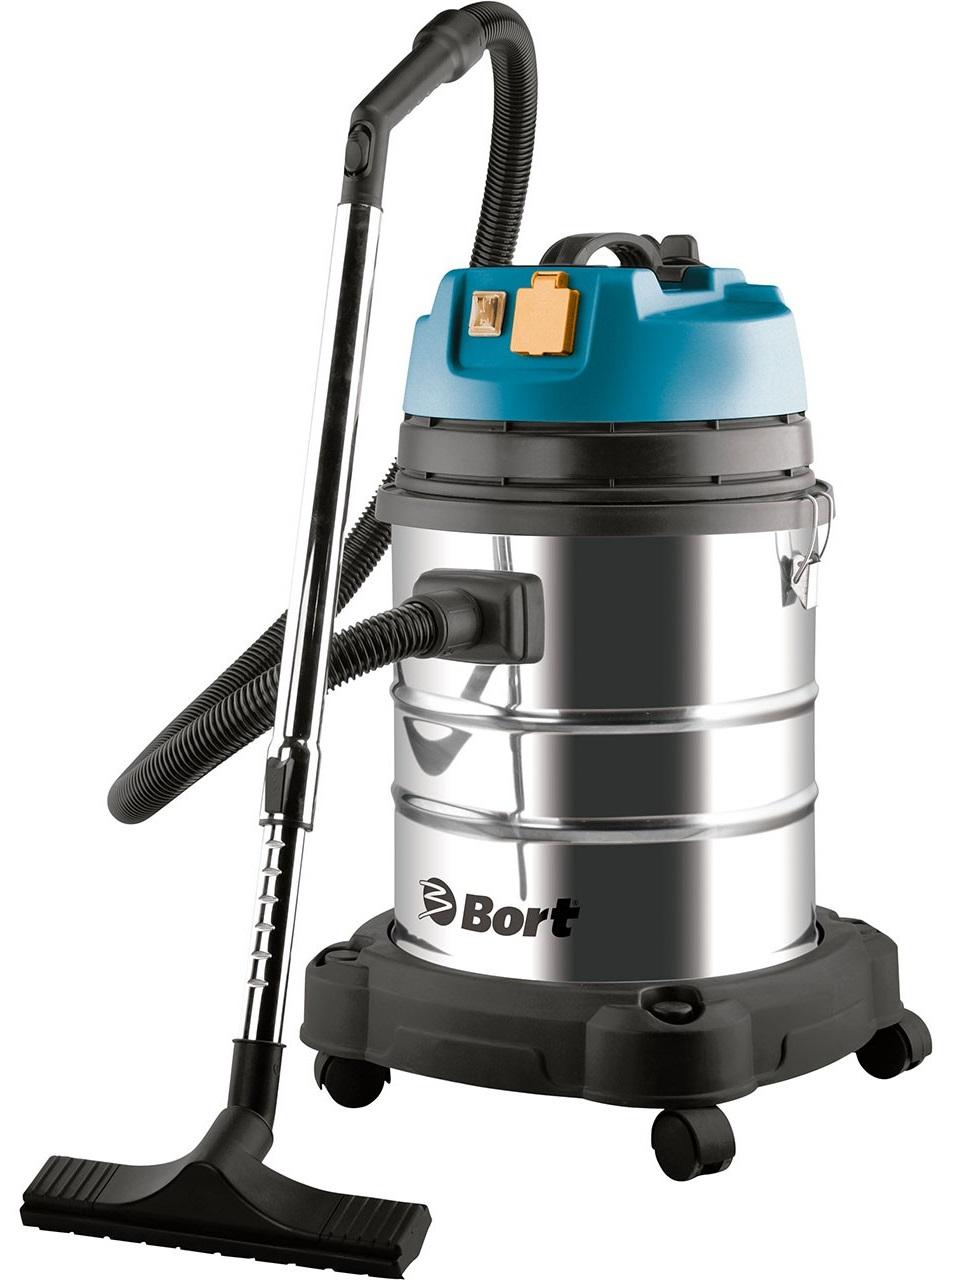 Bort BSS-1440-Pro (98297089) - пылесос промышленный (Silver/Black)